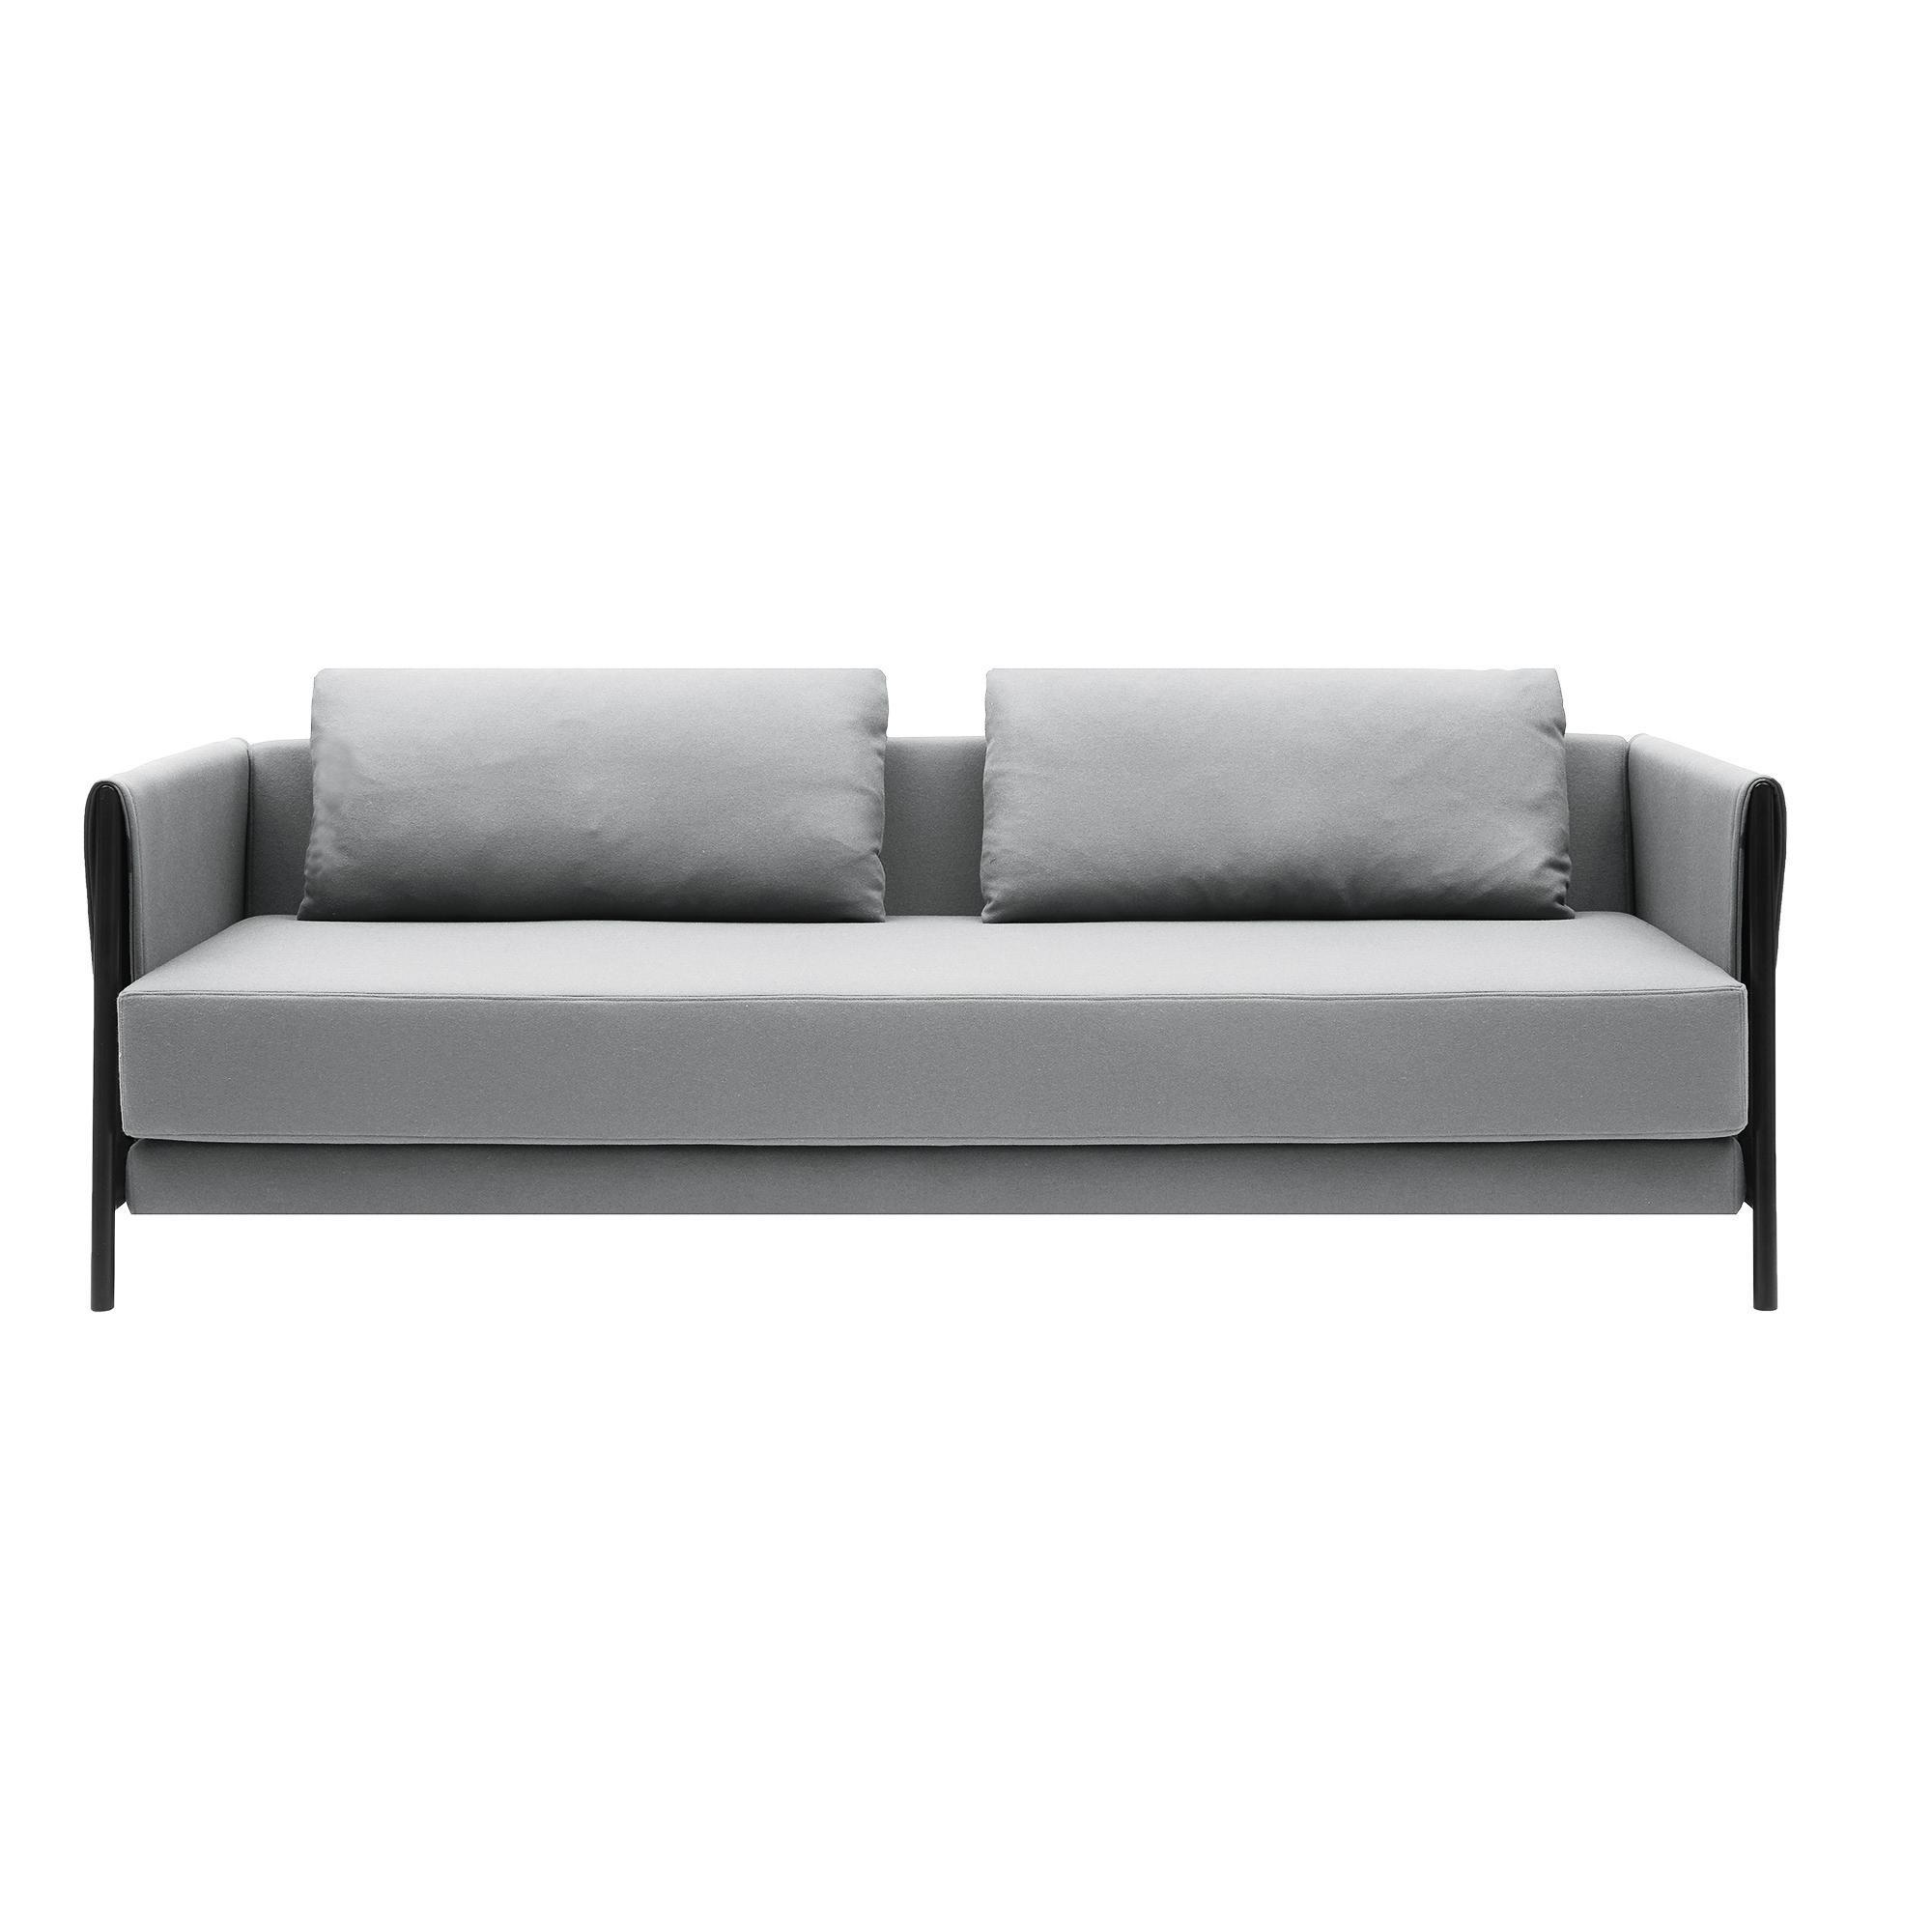 Softline Madison Sofa Bed Ambientedirect